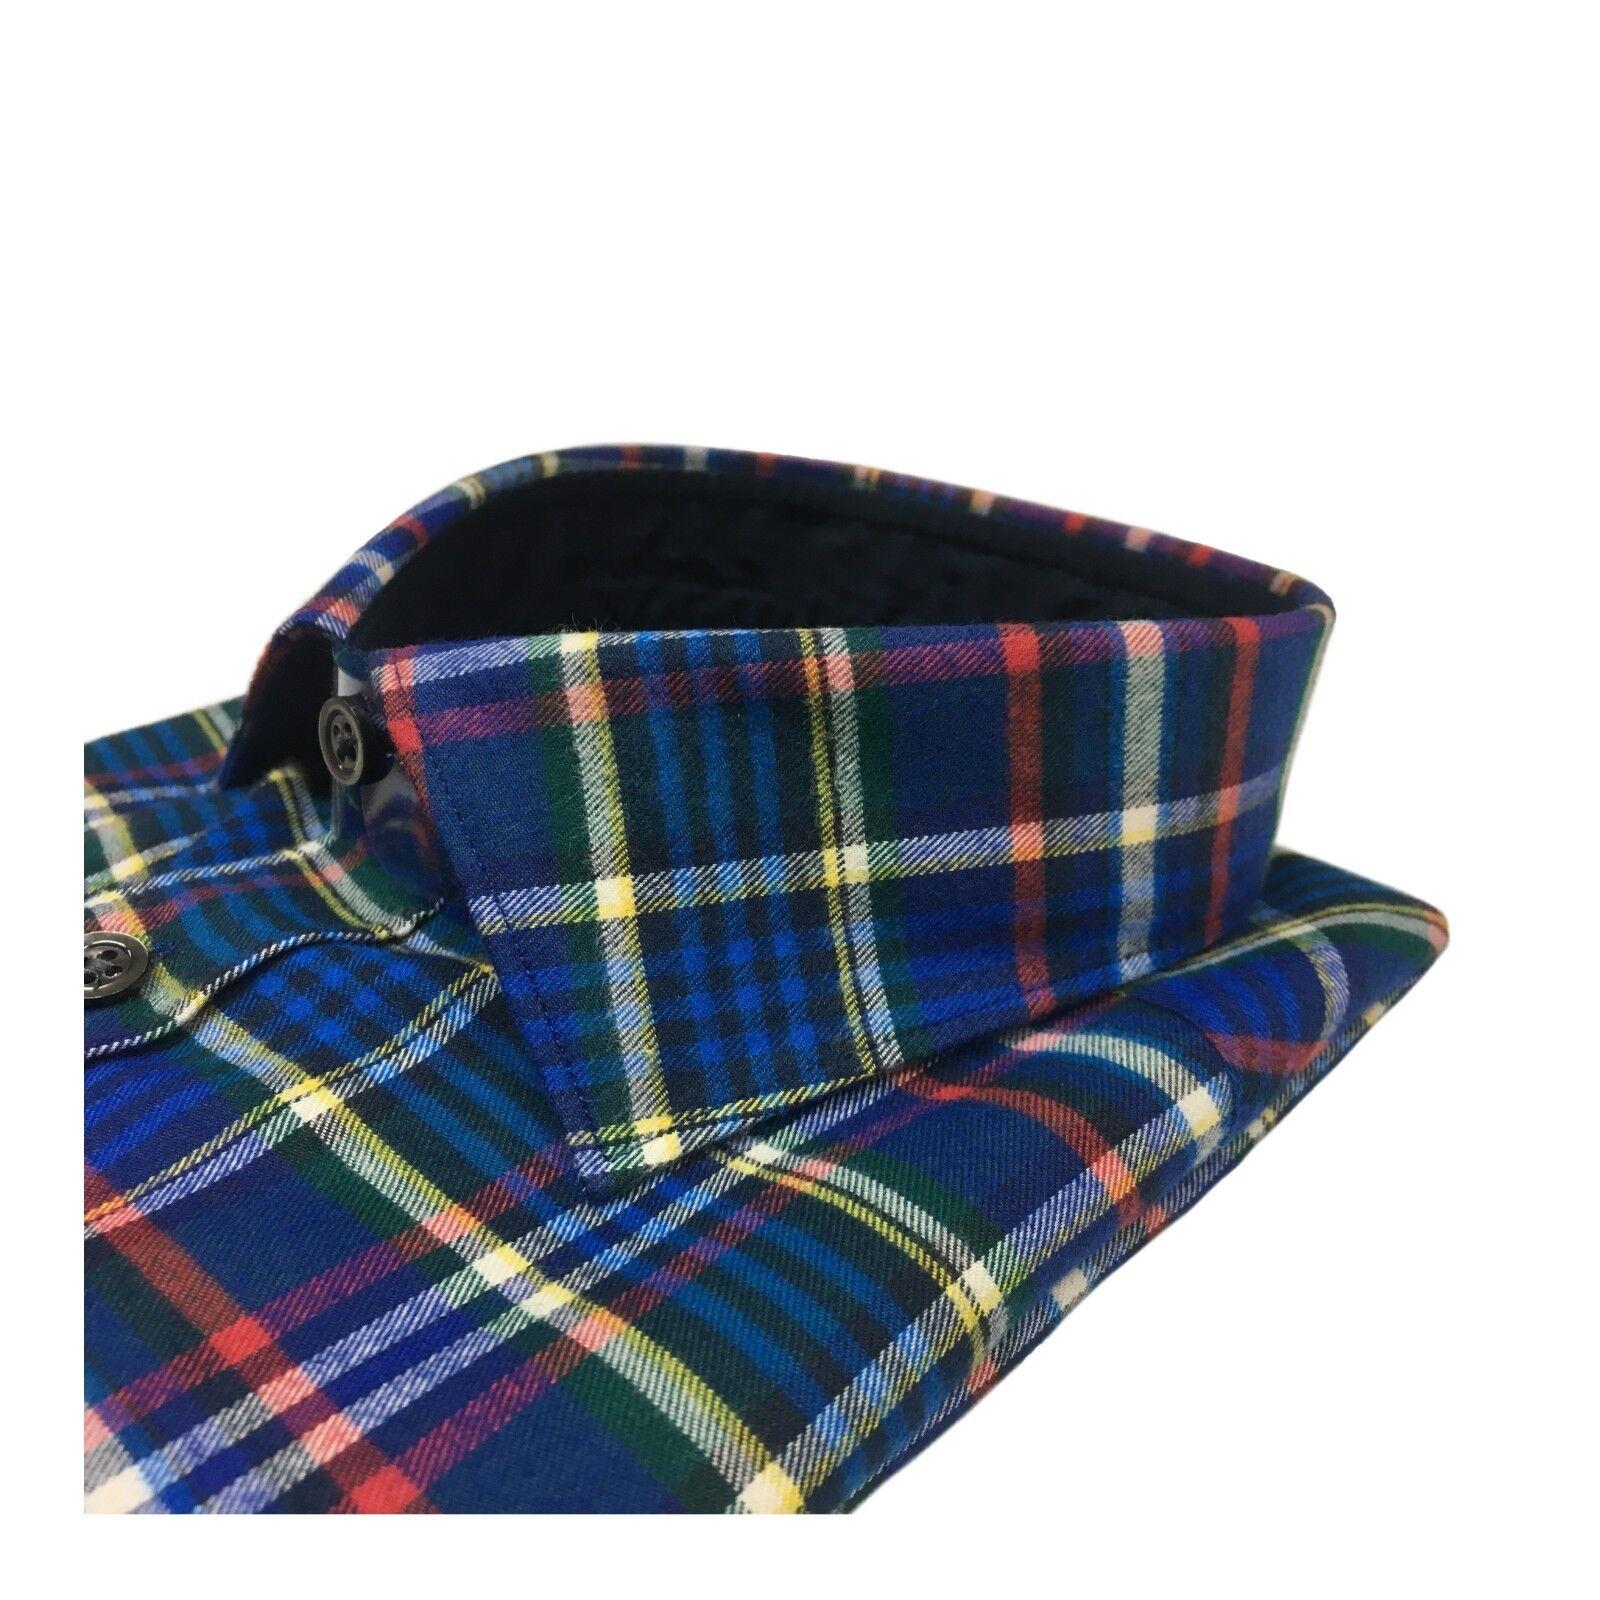 BRANCACCIO Herrenhemd Winter blau rot 100% Baumwolle RANGER 6605 6605 6605 BA41602     | Modern Und Elegant  5b3d6e